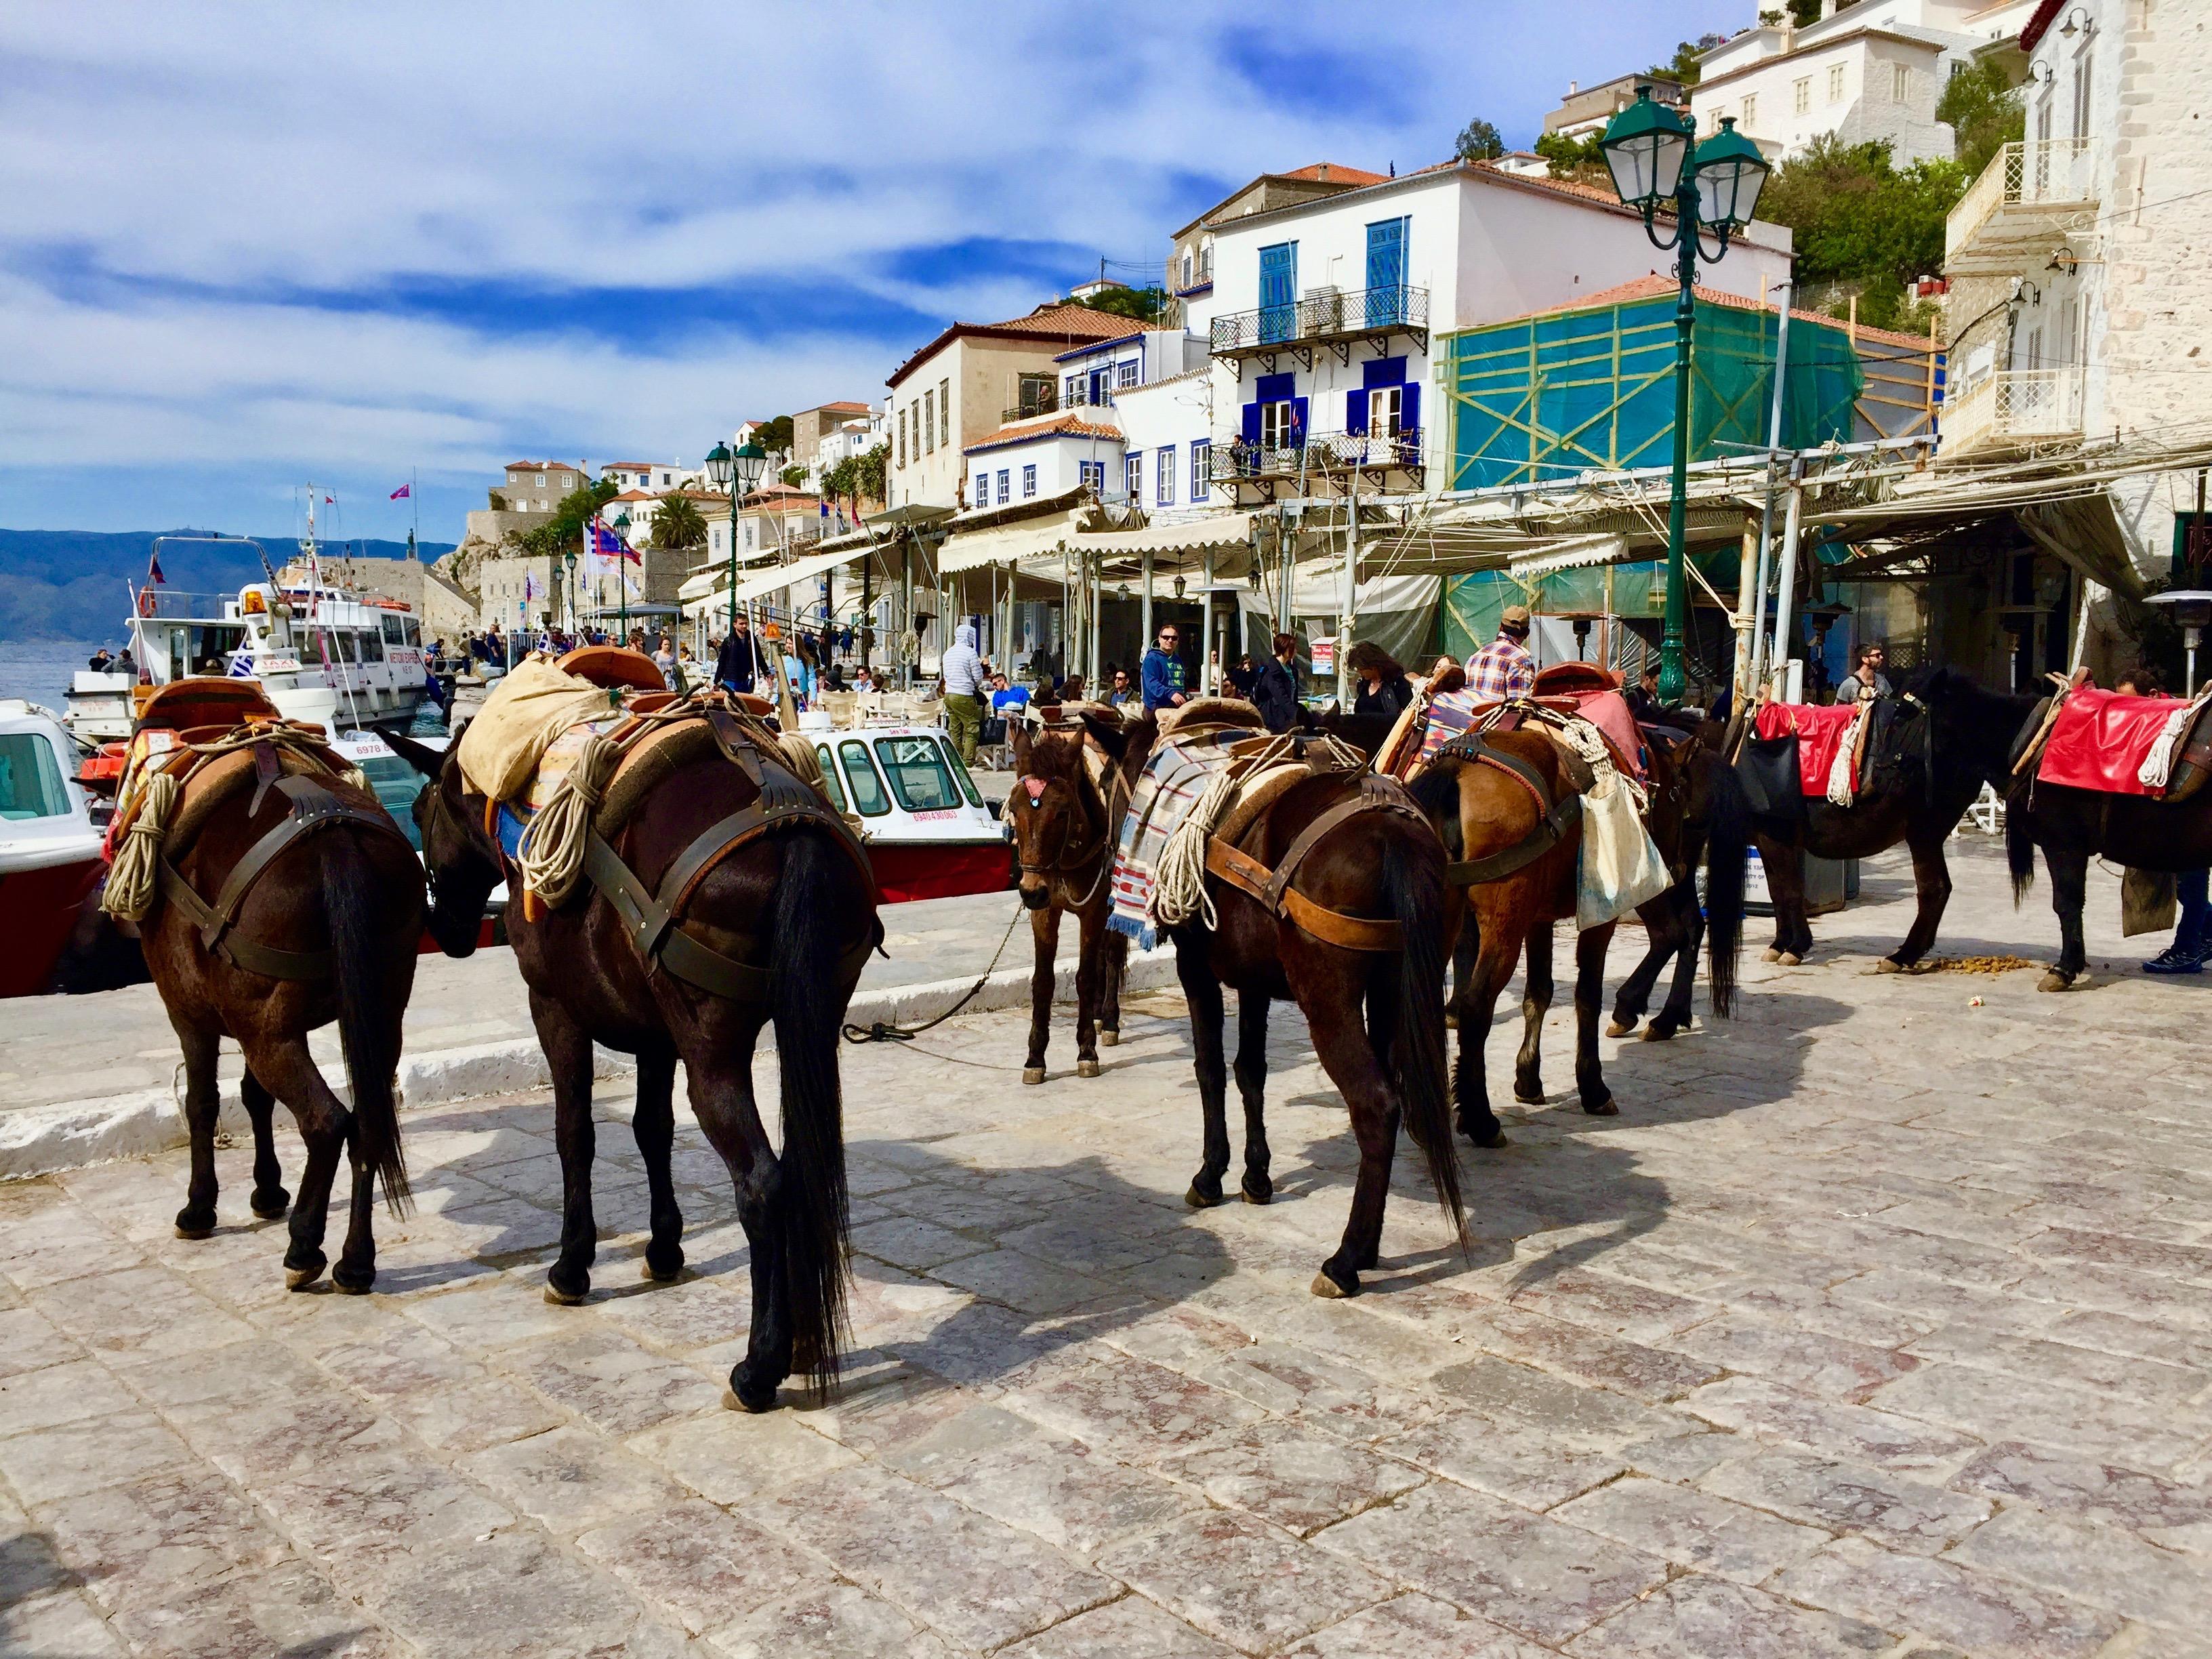 donkeys_hydra_greece_lustforthesublime